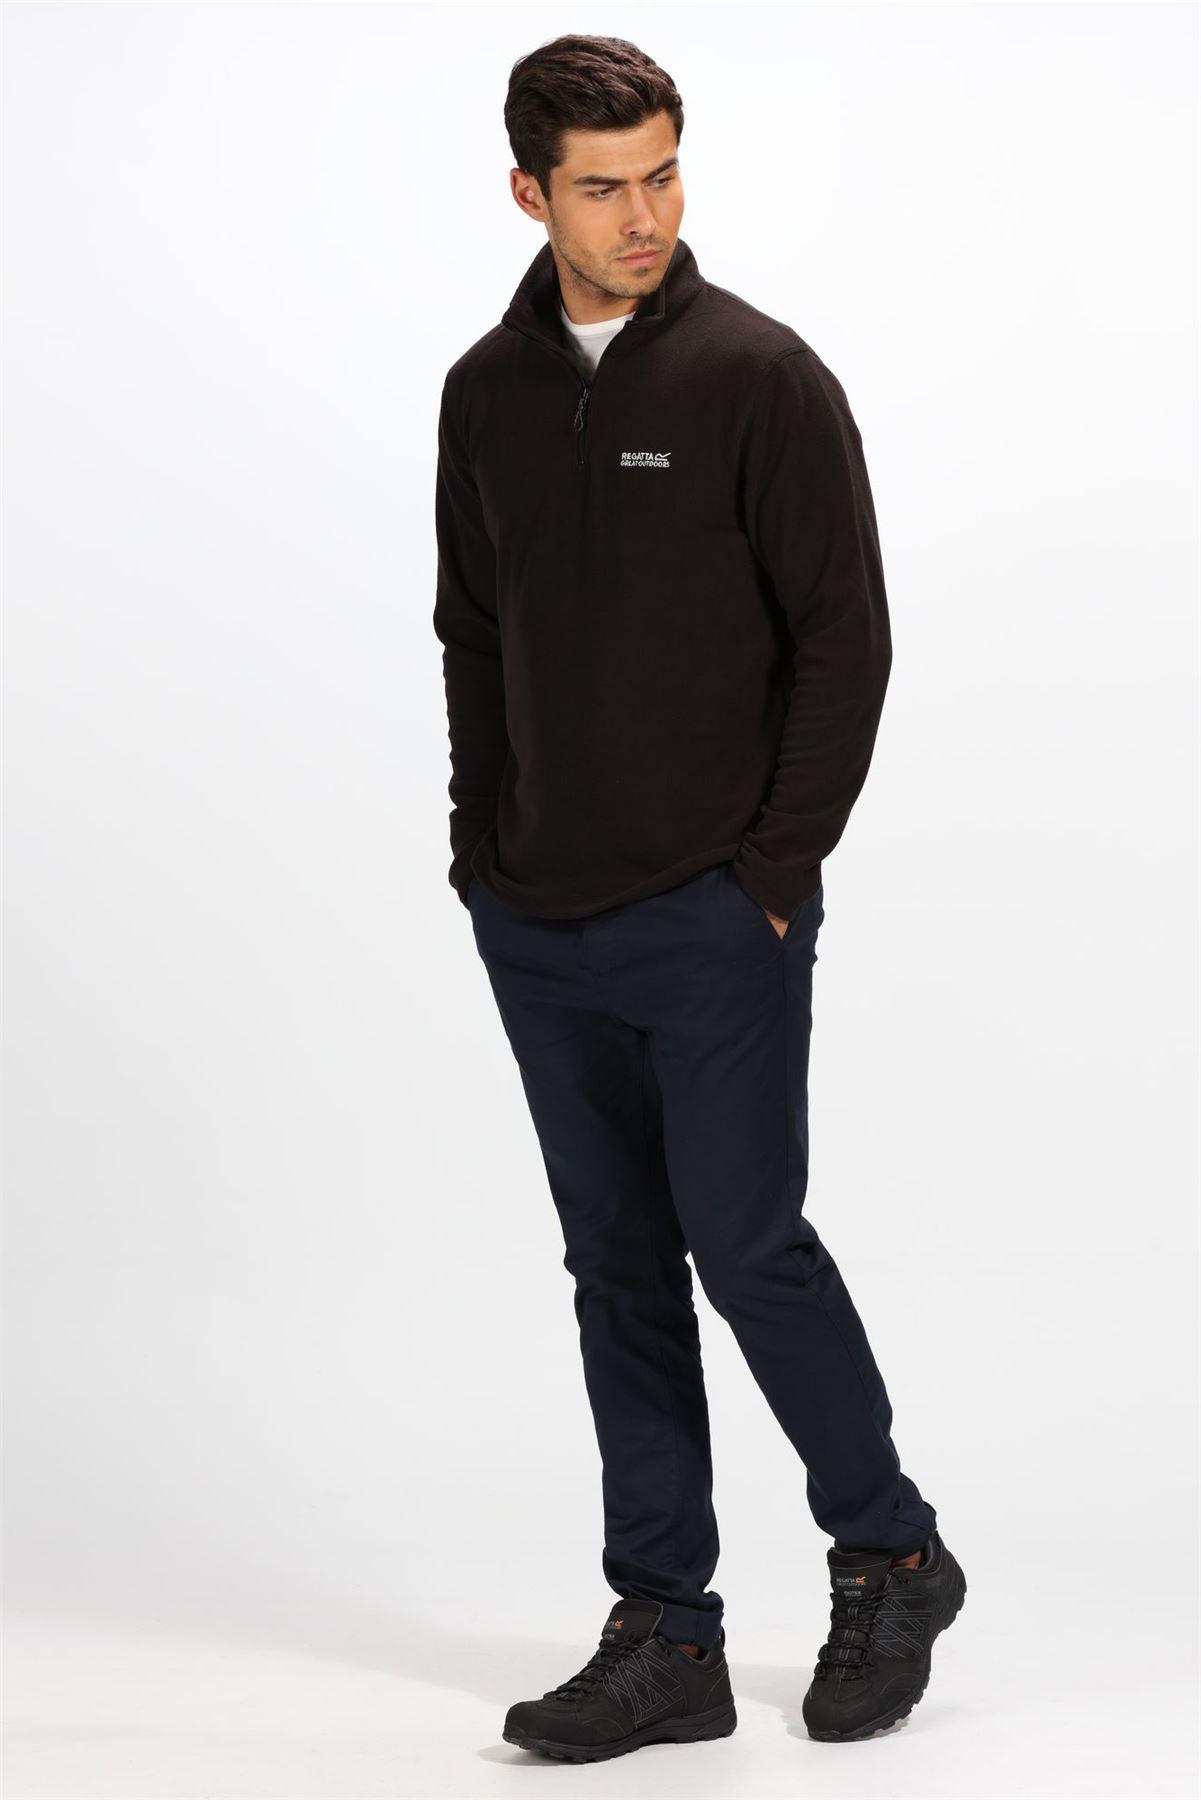 REGATTA Mens Quarter Zip Classic Lightweight Fleece SweaterSALERRP £25